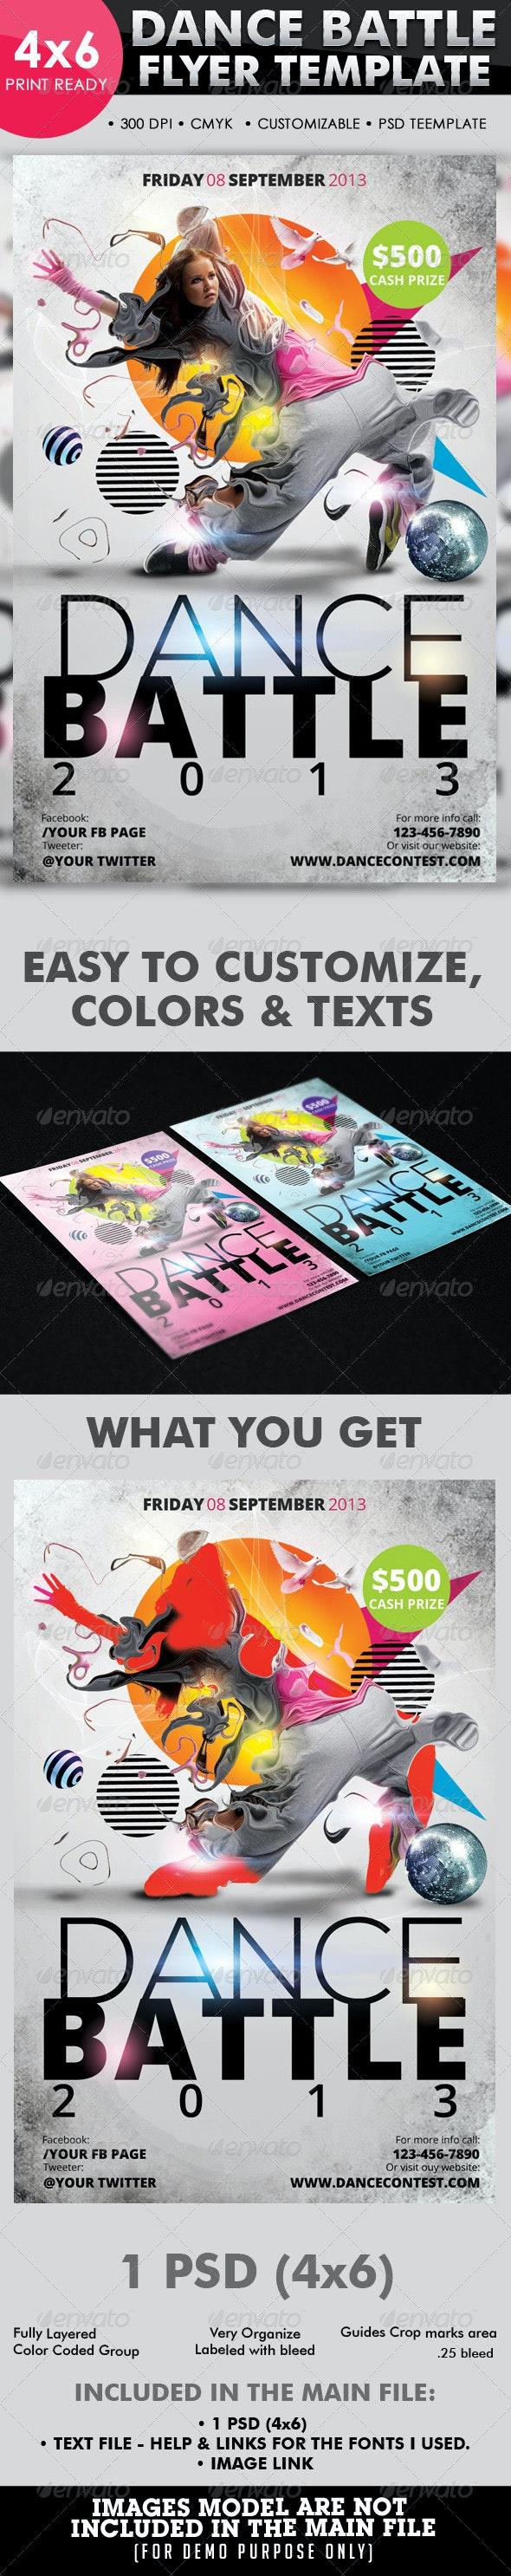 Dance Battle Flyer Template - Flyers Print Templates